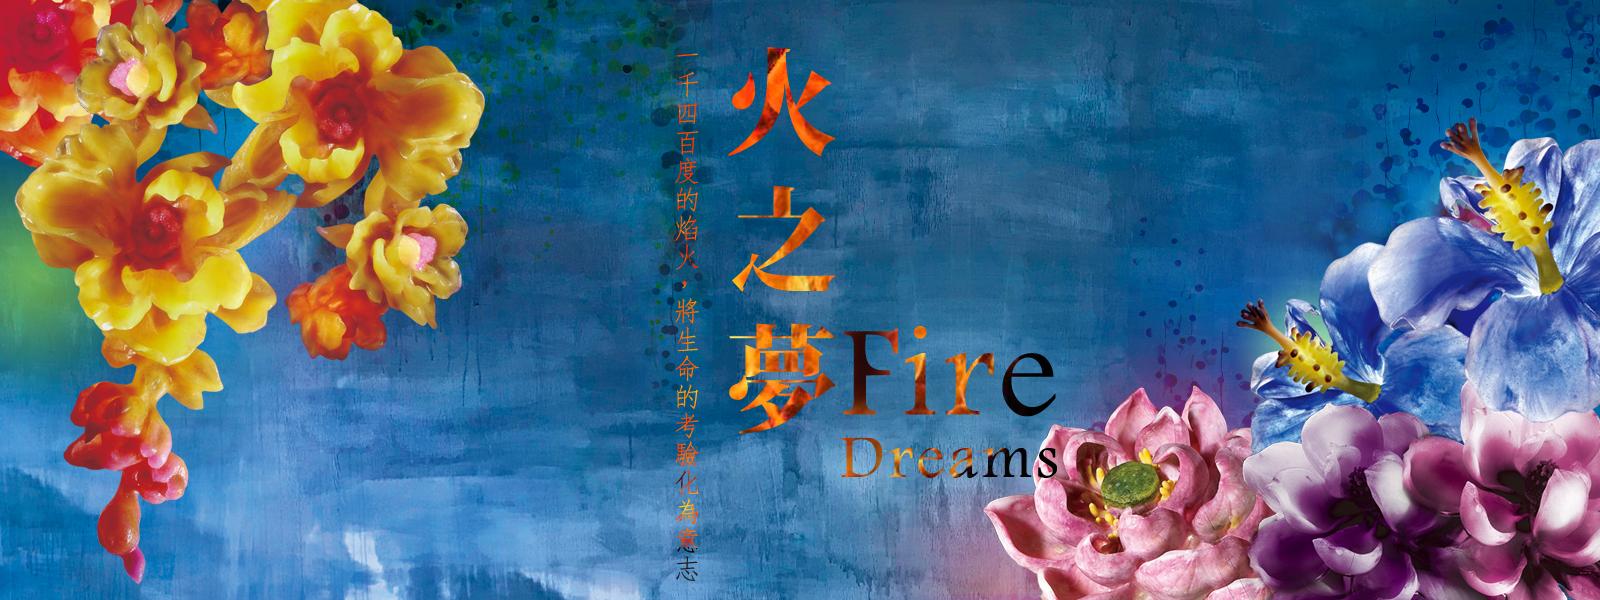 Fire Dreams.火之夢